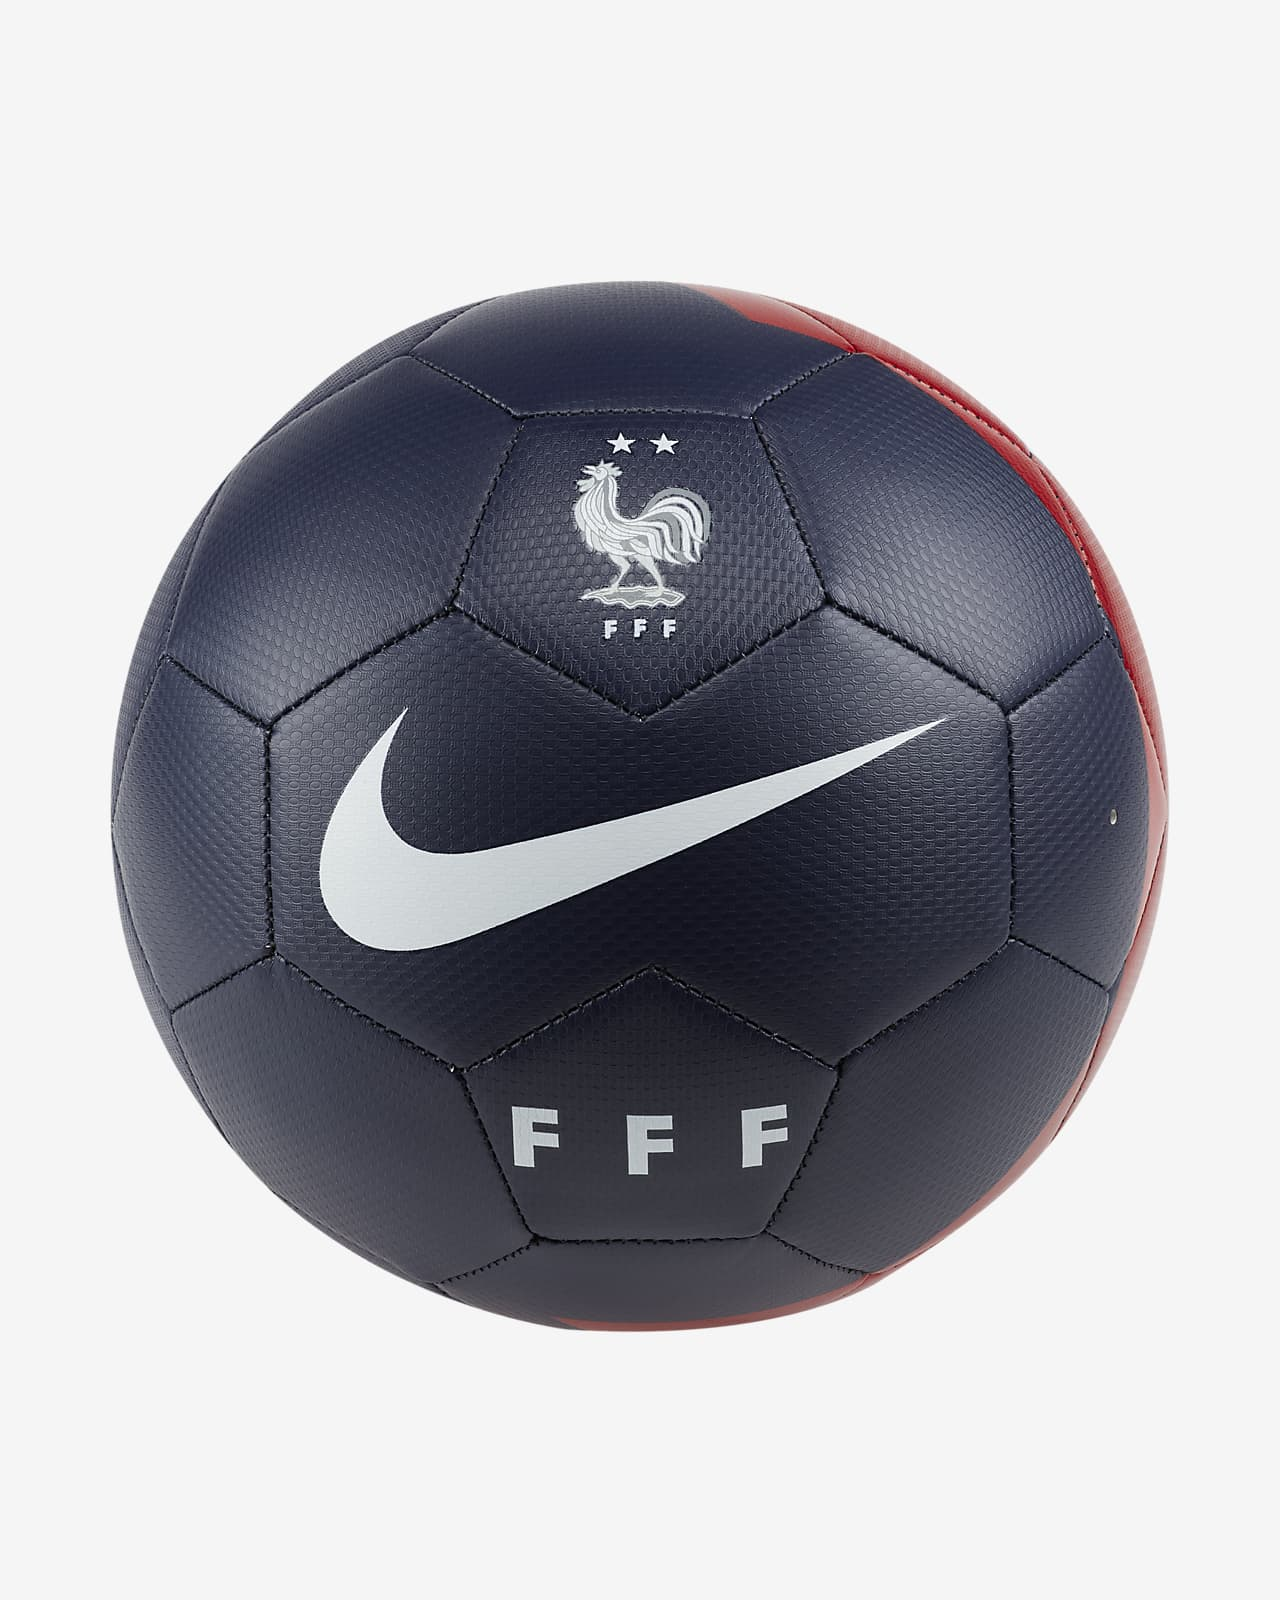 Ballon de football FFF Prestige